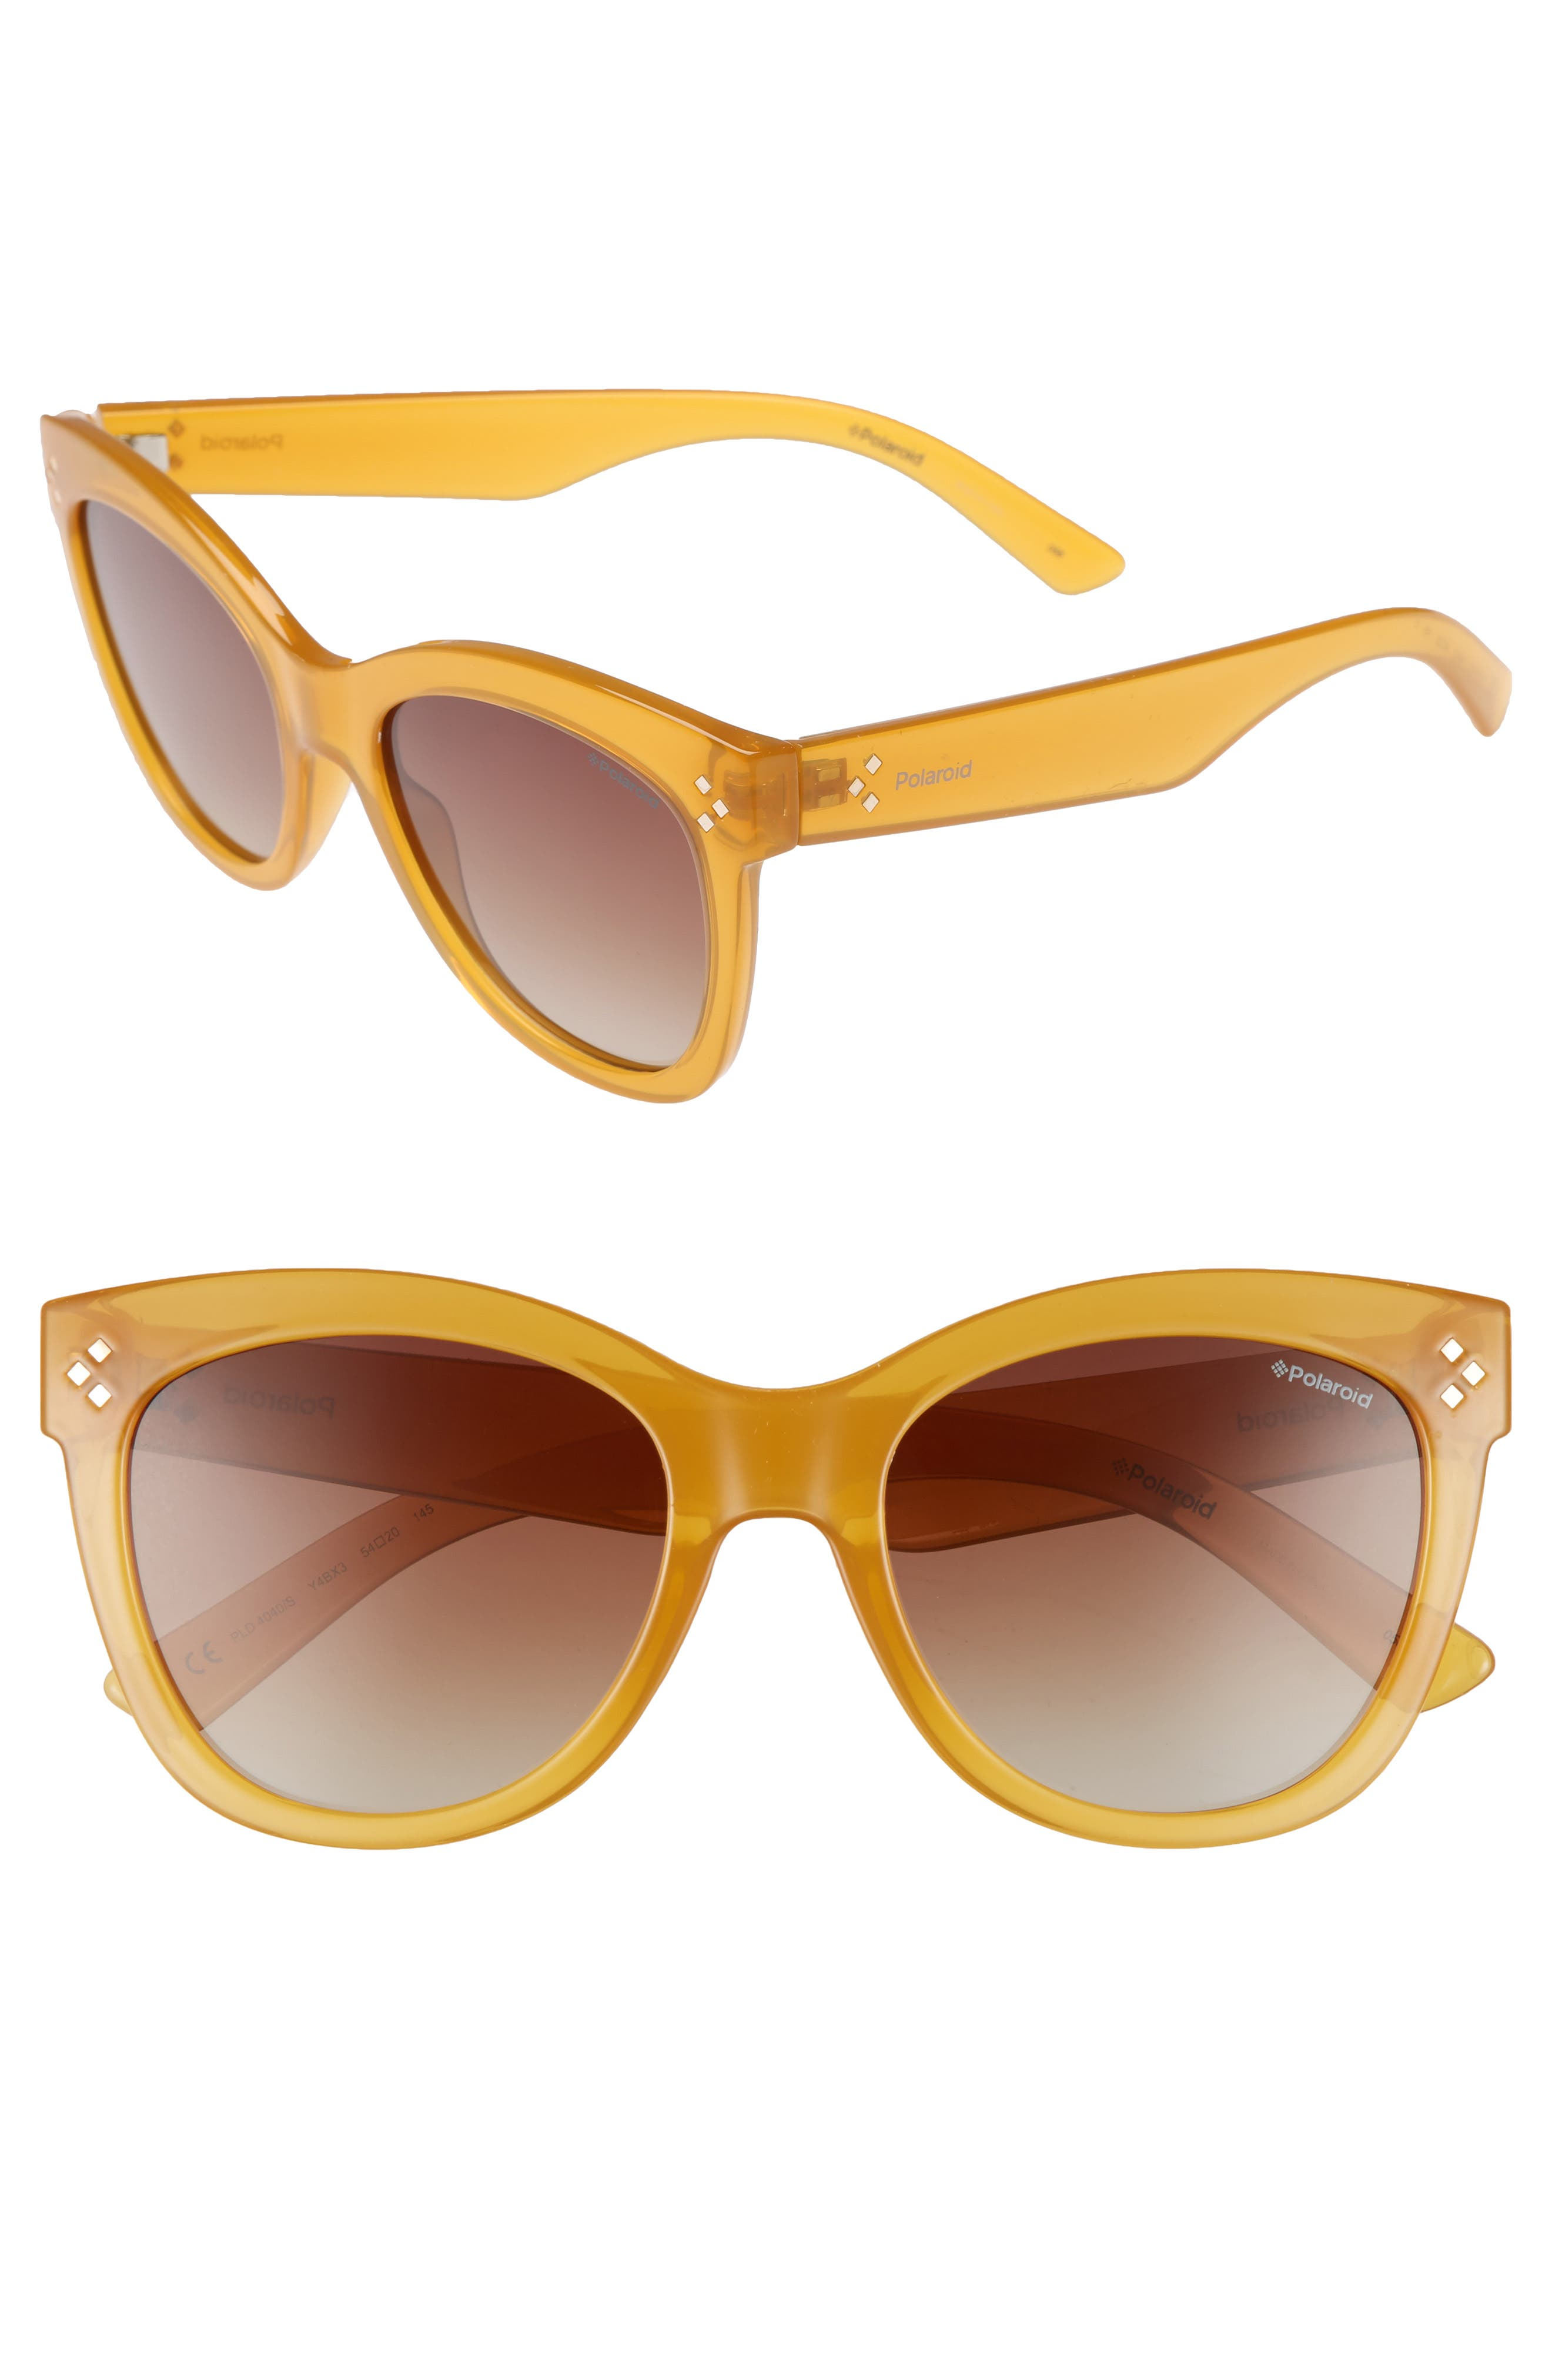 54mm Polarized Sunglasses,                         Main,                         color, 700